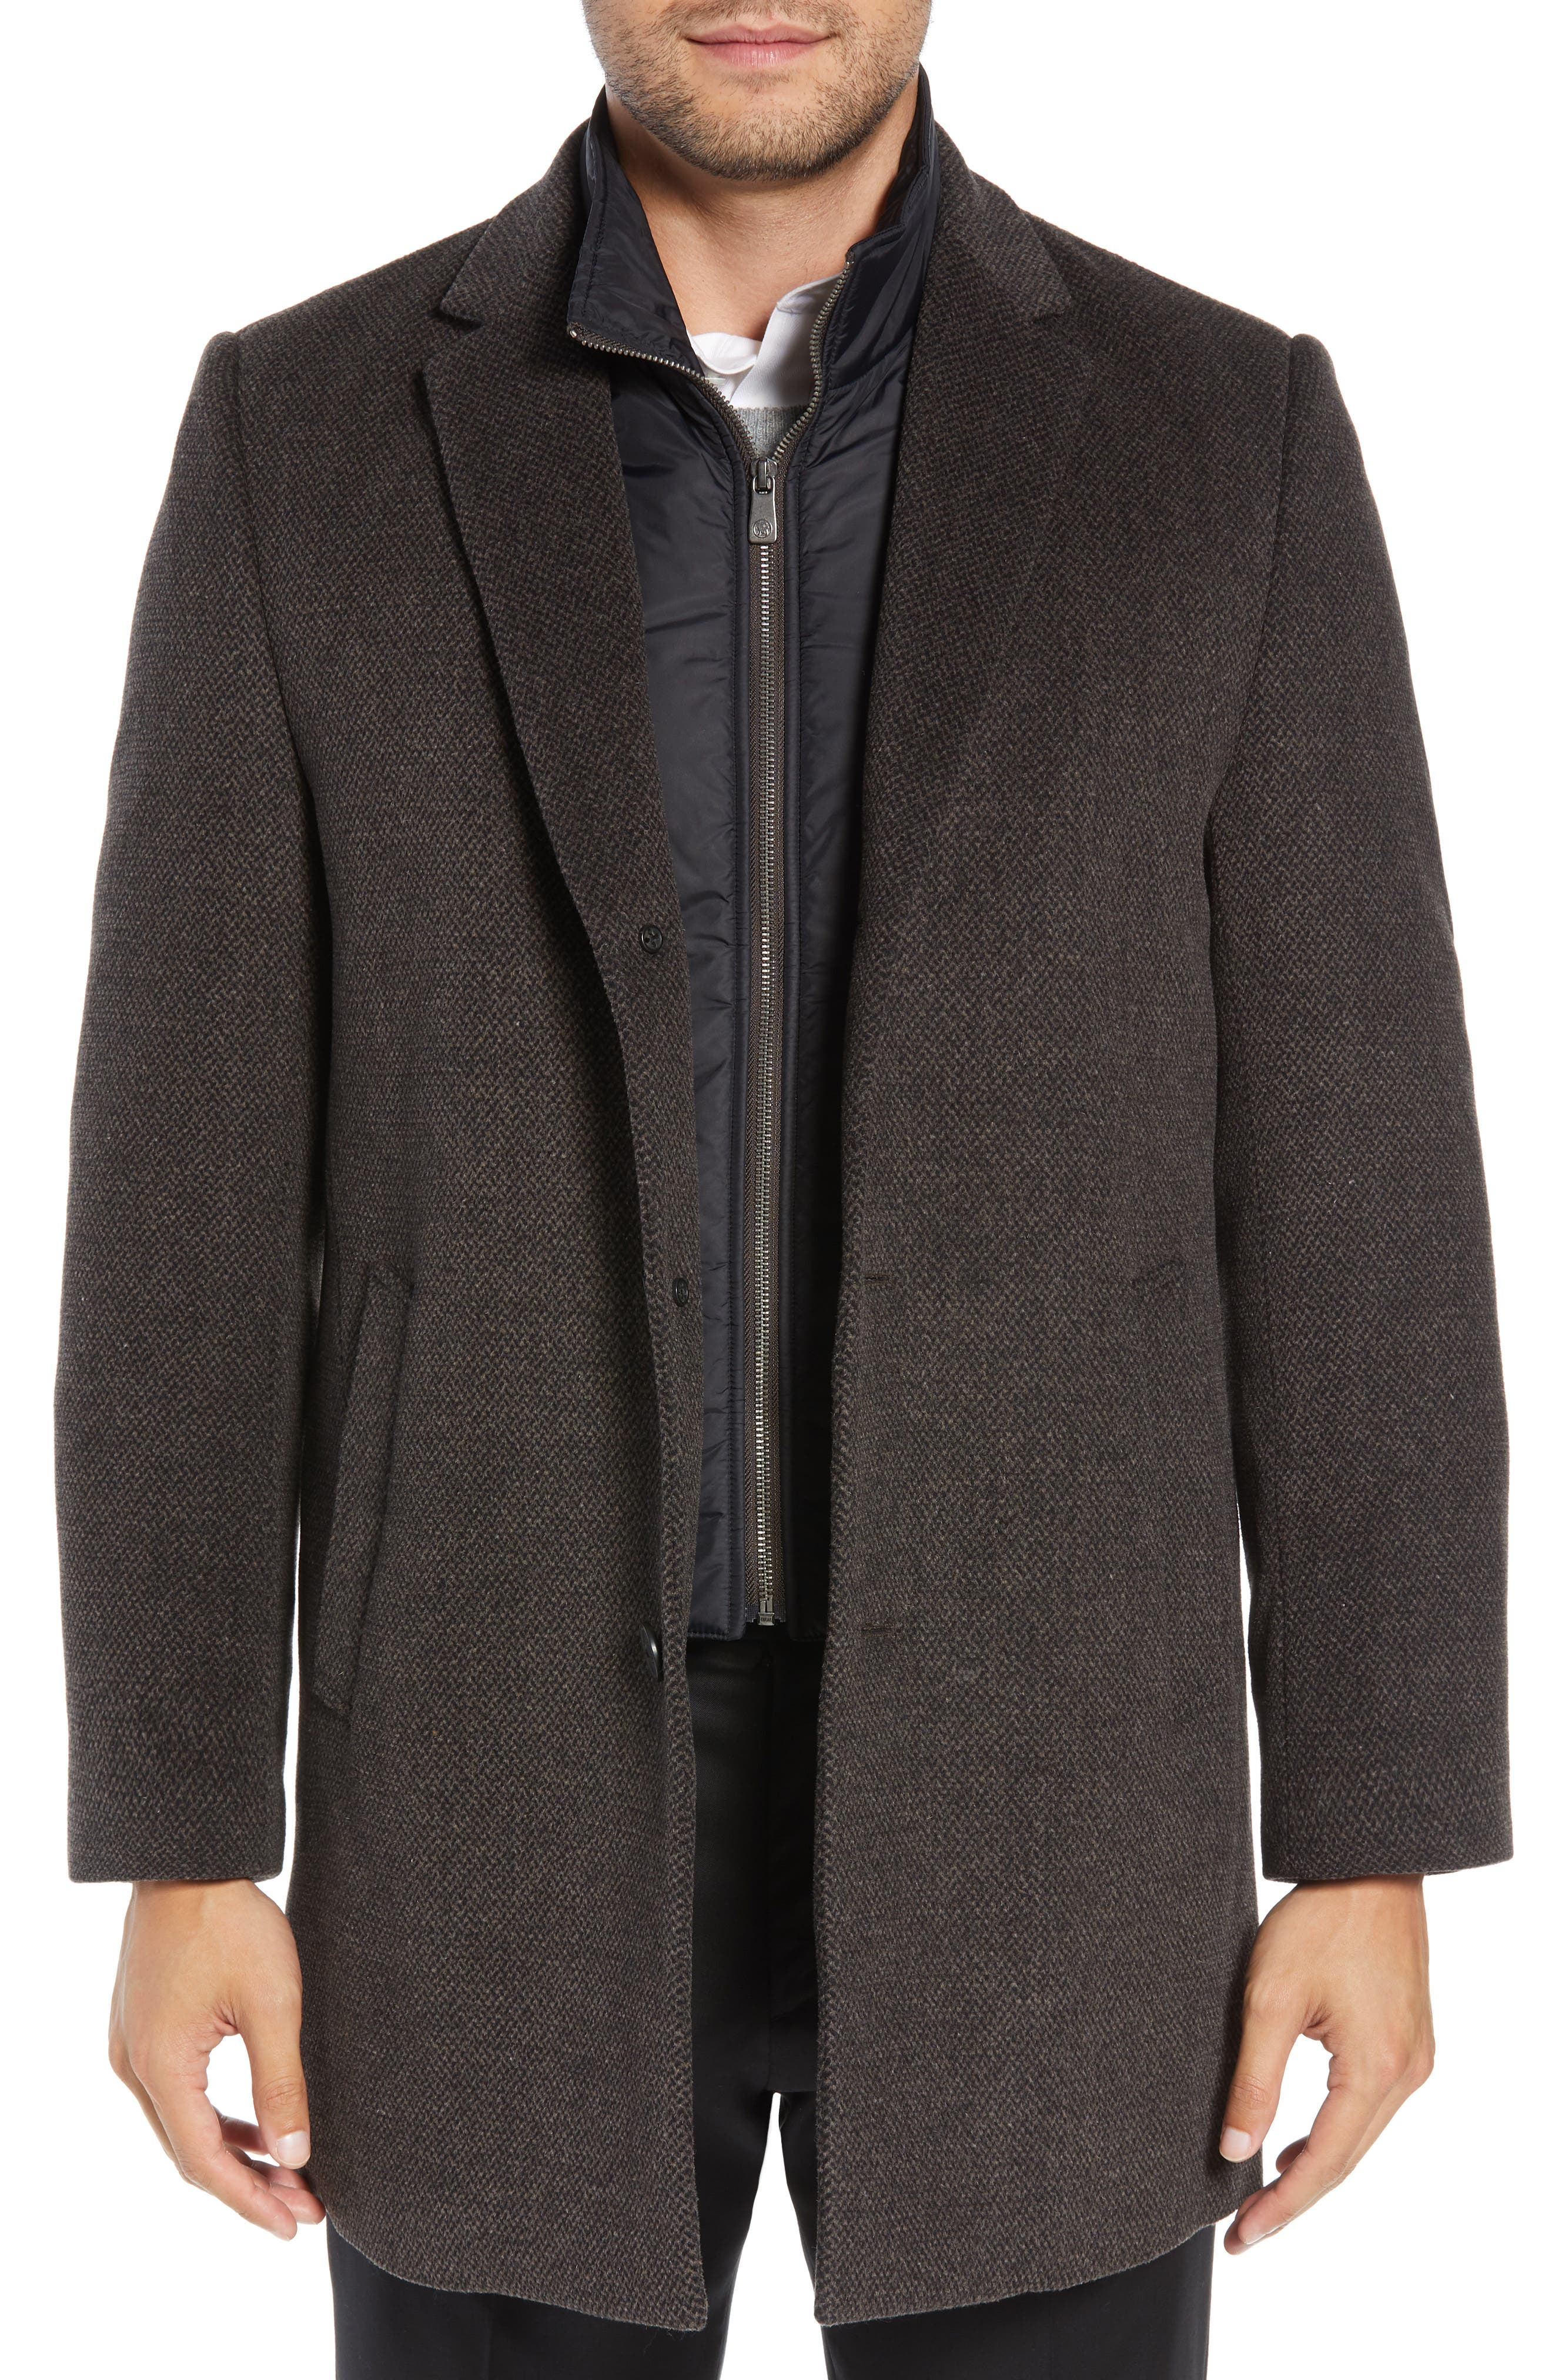 Kingman Modern Fit Wool Blend Coat with Removable Zipper Bib,                         Main,                         color,